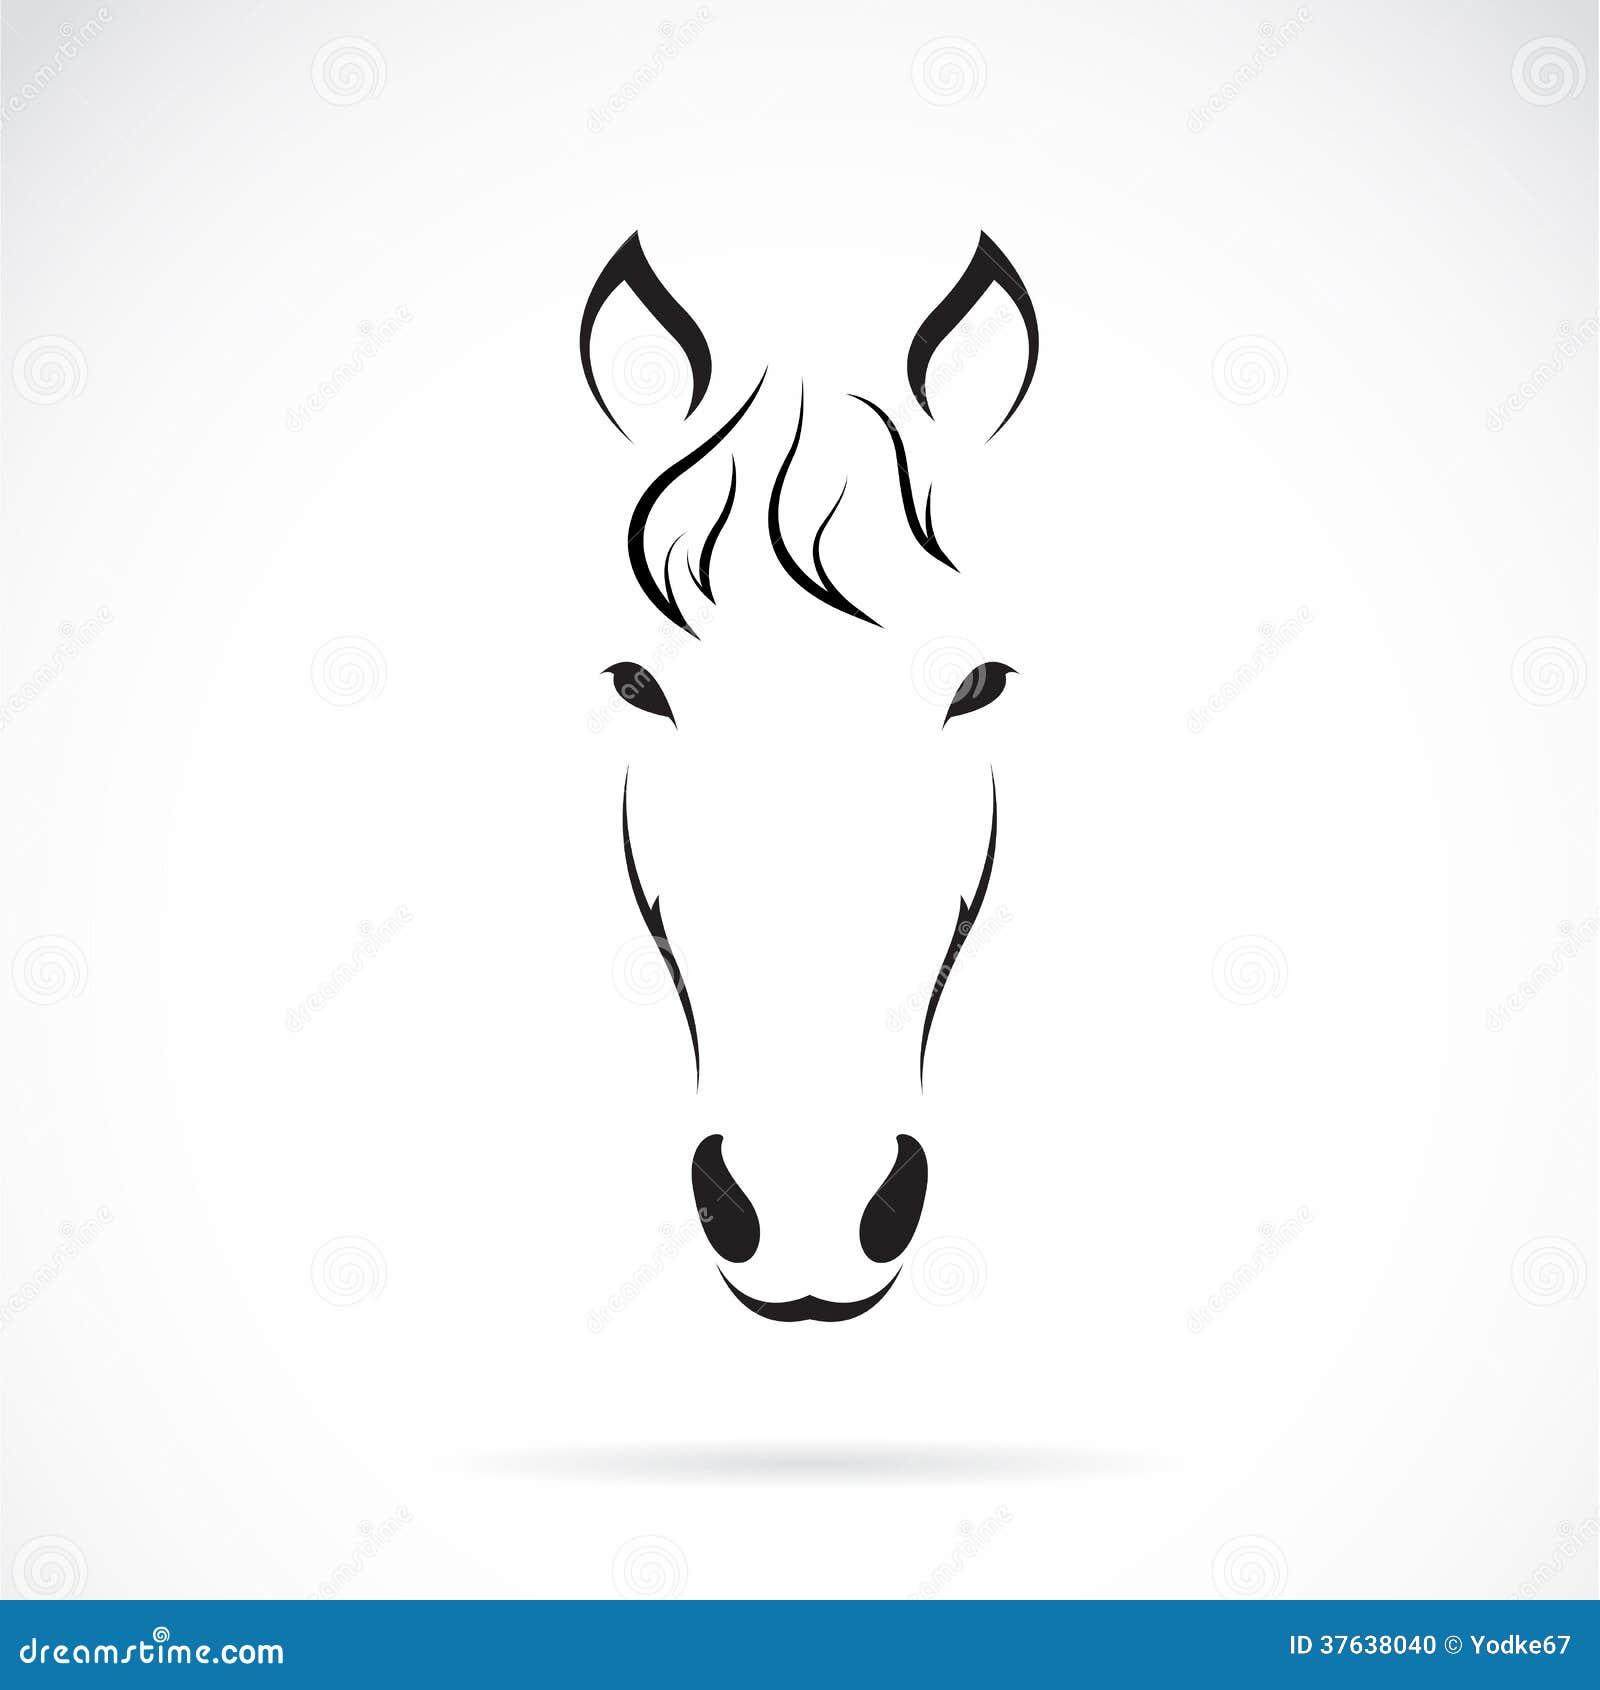 441 furthermore 152420858934 furthermore Stock Illustratie Paarden Vector Tekening Image65474316 also Dual Exhaust Kit Arvinode Concours 65 66 289 Mustang also Colorir Sereia Ariel Princesa Pintar. on mustang s